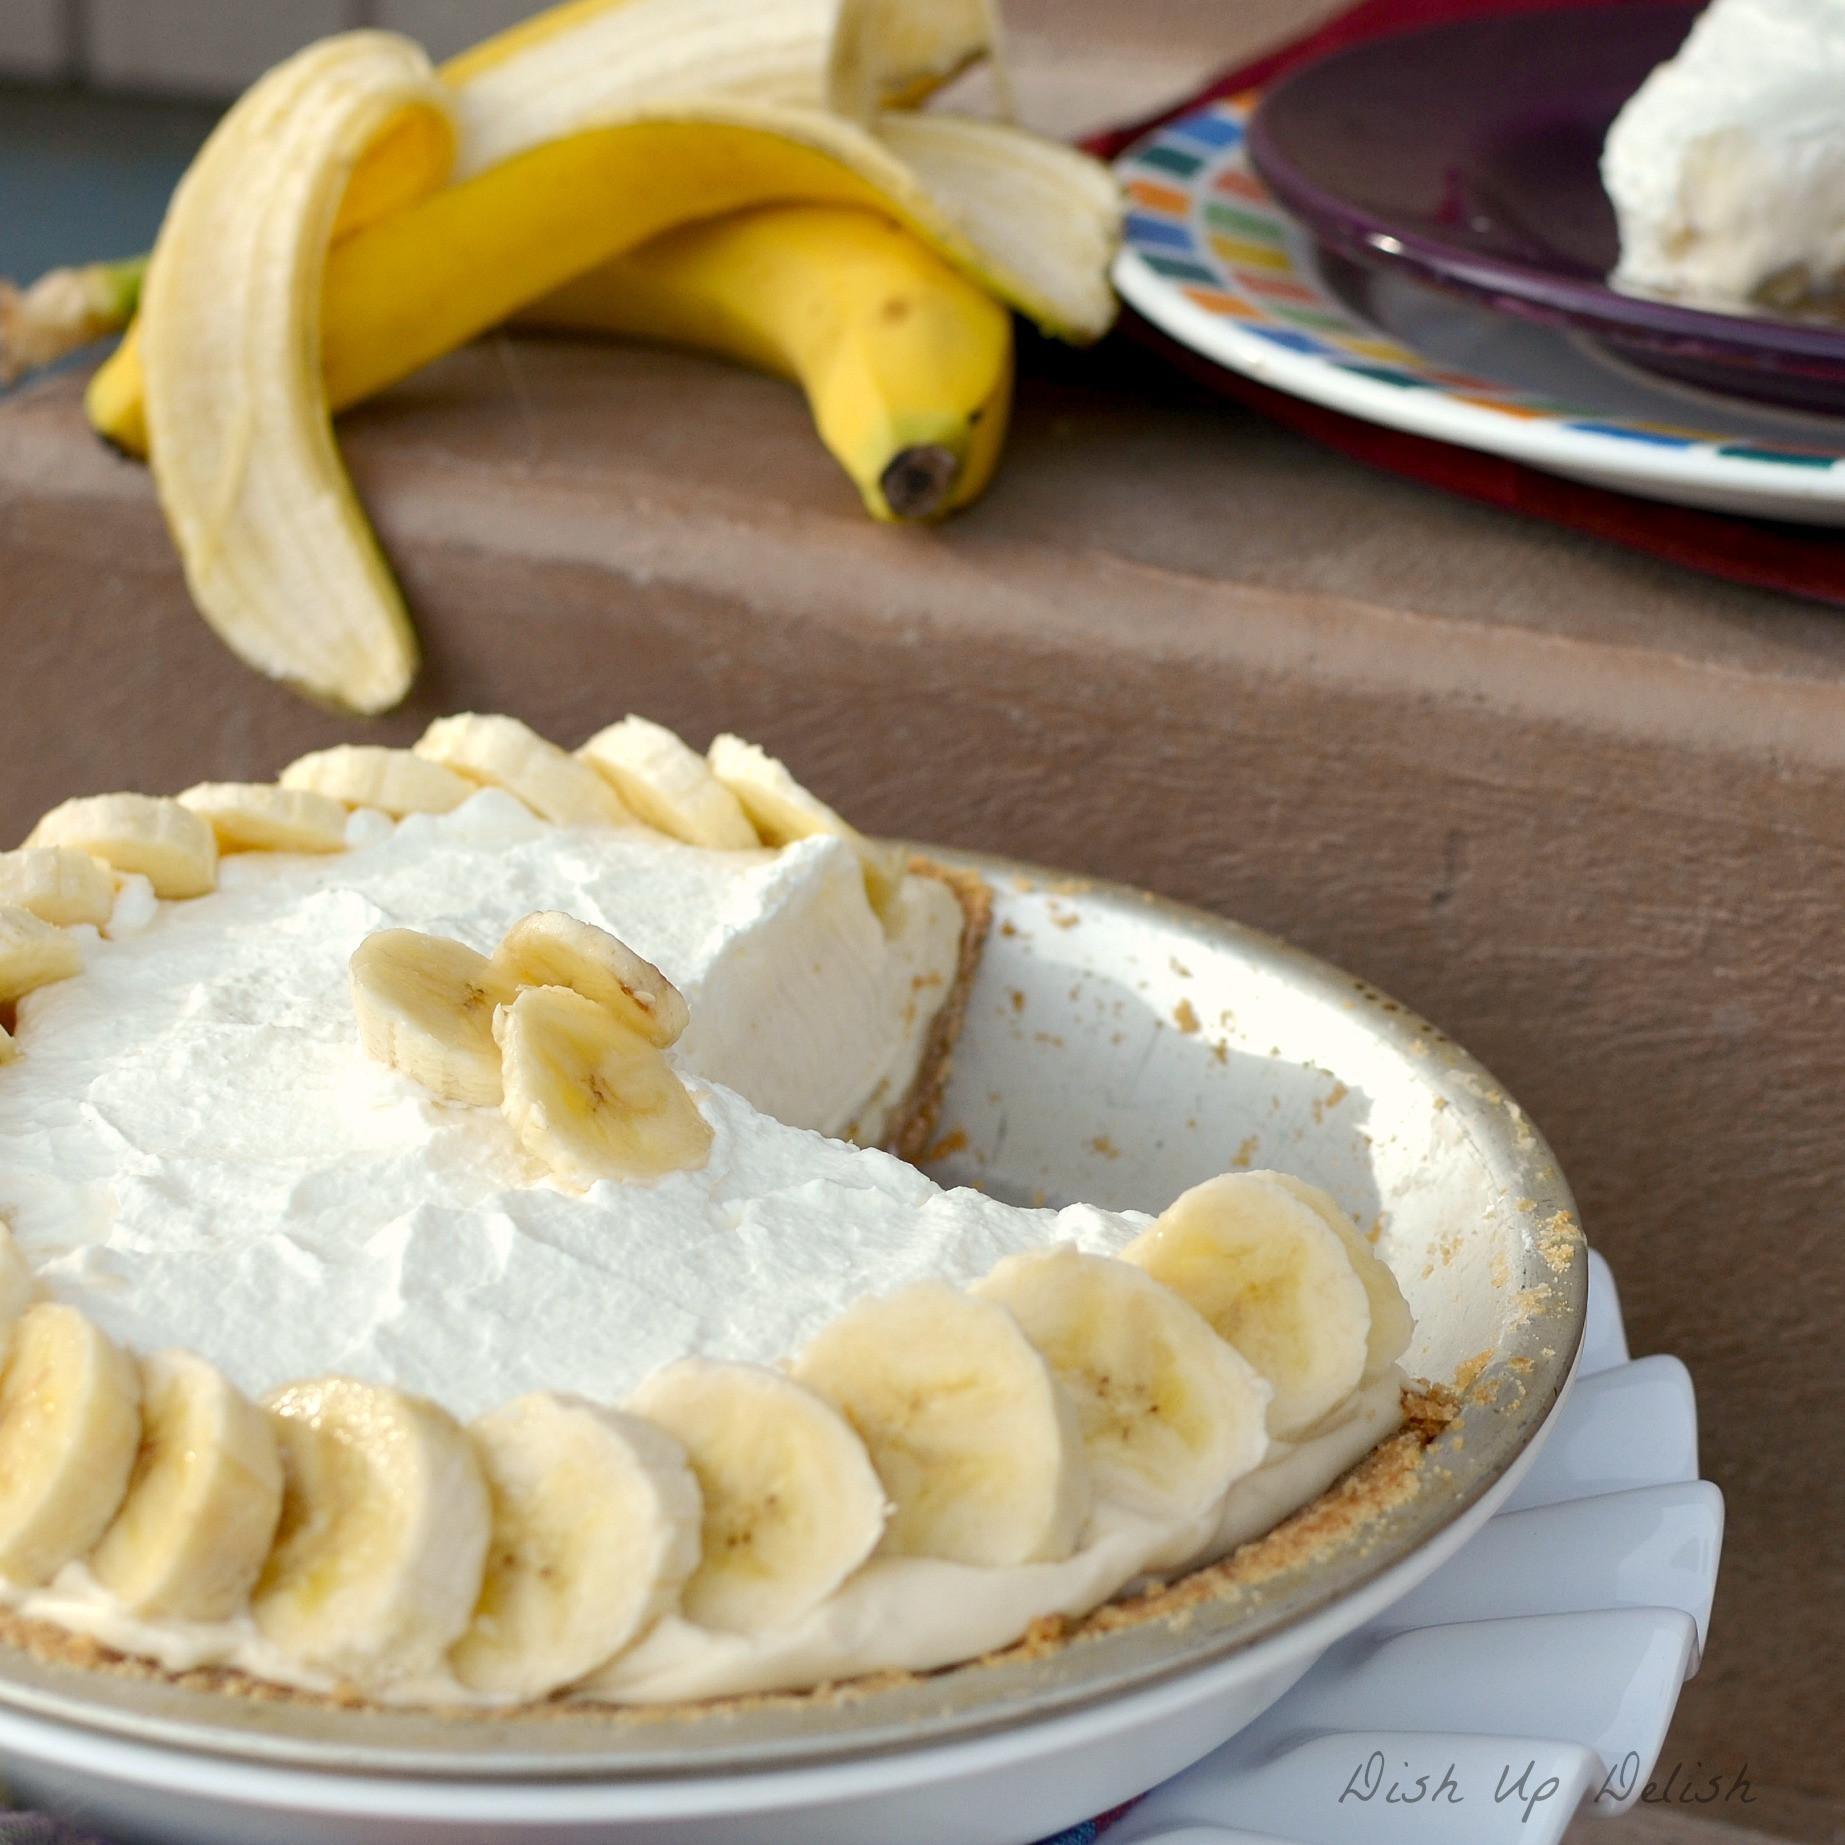 Banana Cream Pie  From scratch Banana Cream Pie